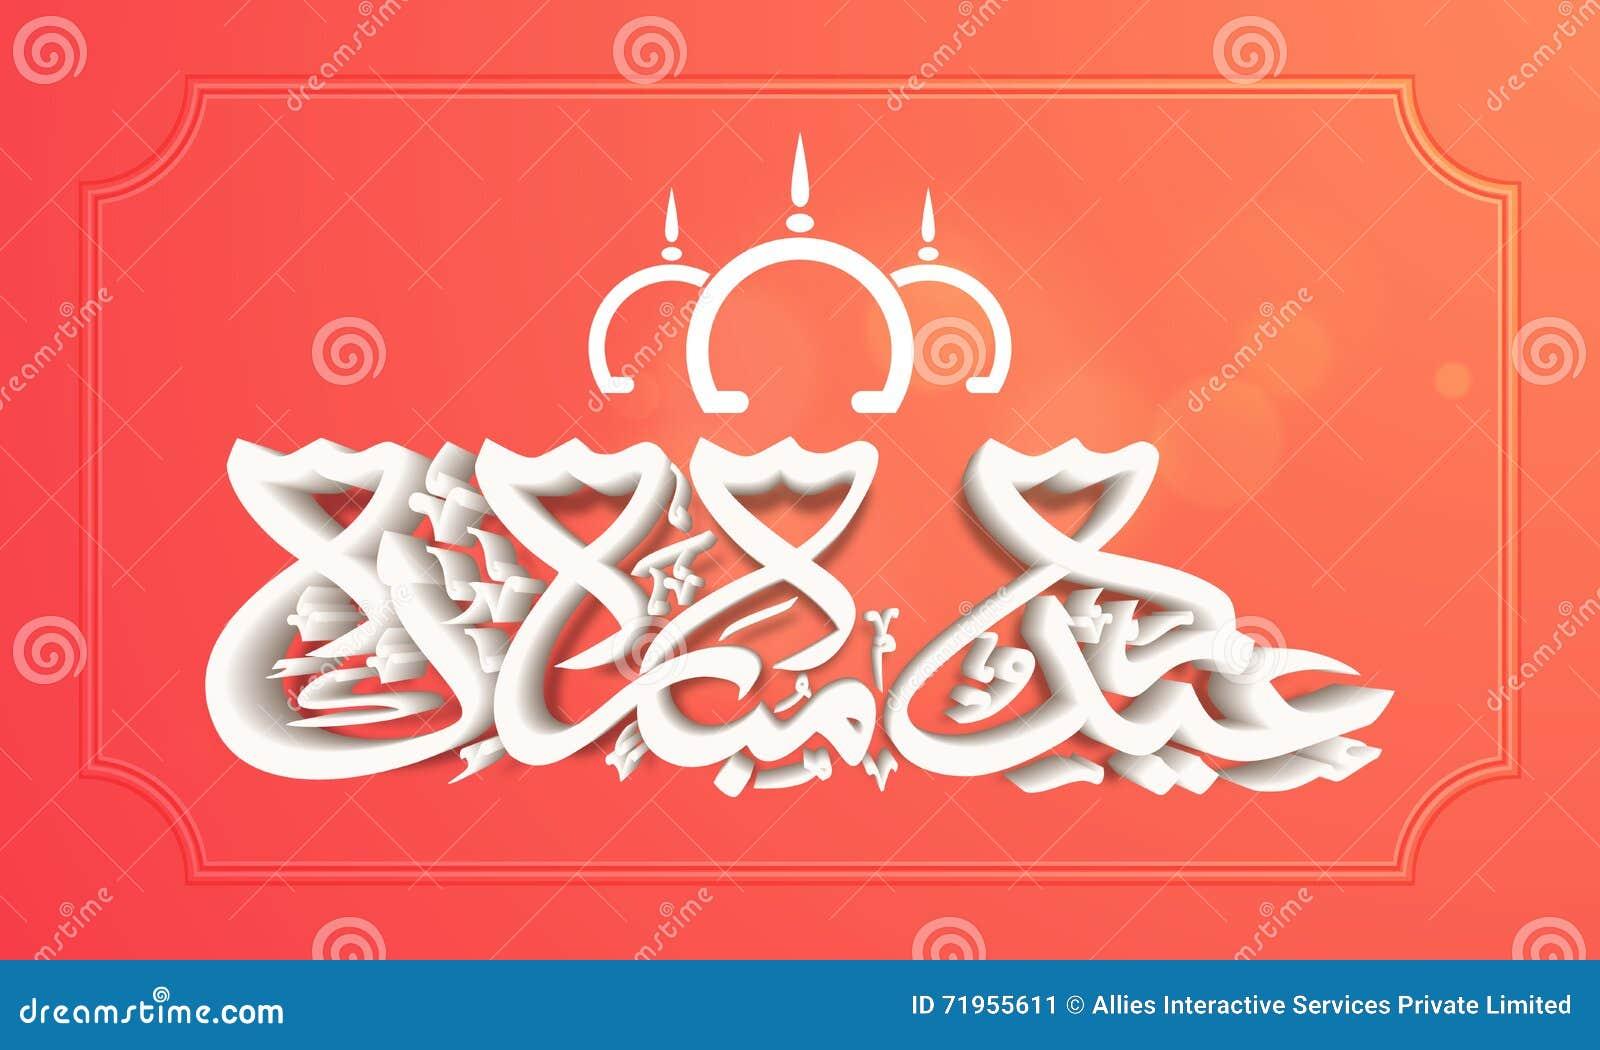 3d Arabic Islamic Calligraphy For Eid Celebration Stock